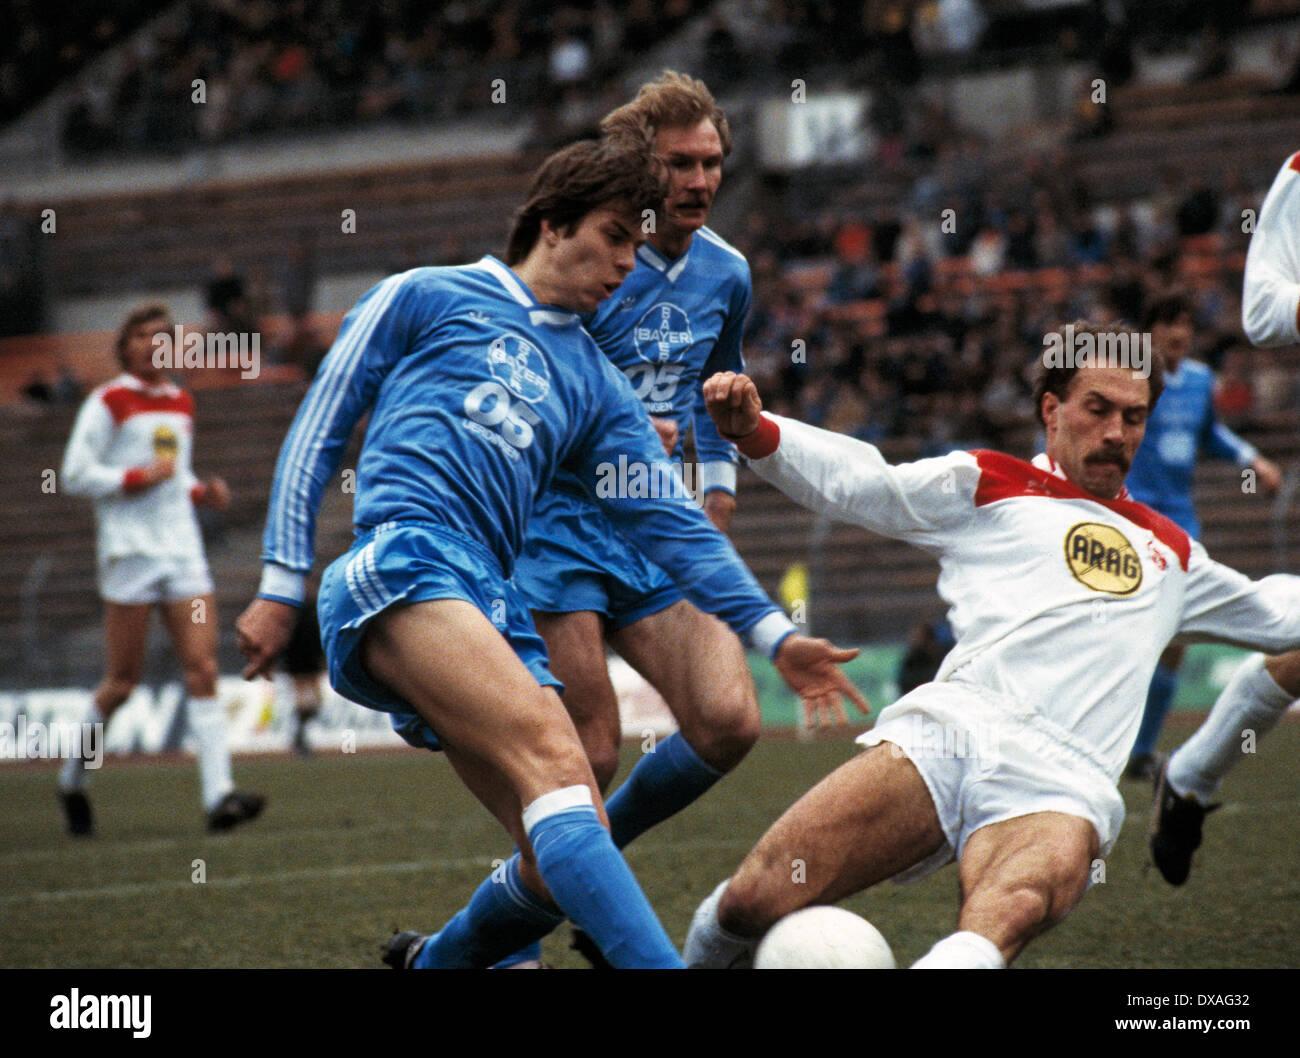 football, Bundesliga, 1984/1985, Rhine Stadium, Fortuna Duesseldorf versus FC Bayer 05 Uerdingen 2:2, scene of the match, duel, tackling, Larus Gudmundsson (Bayer) left and Peter Loehr (Fortuna), behind Wolfgang Schaefer (Bayer) - Stock Image